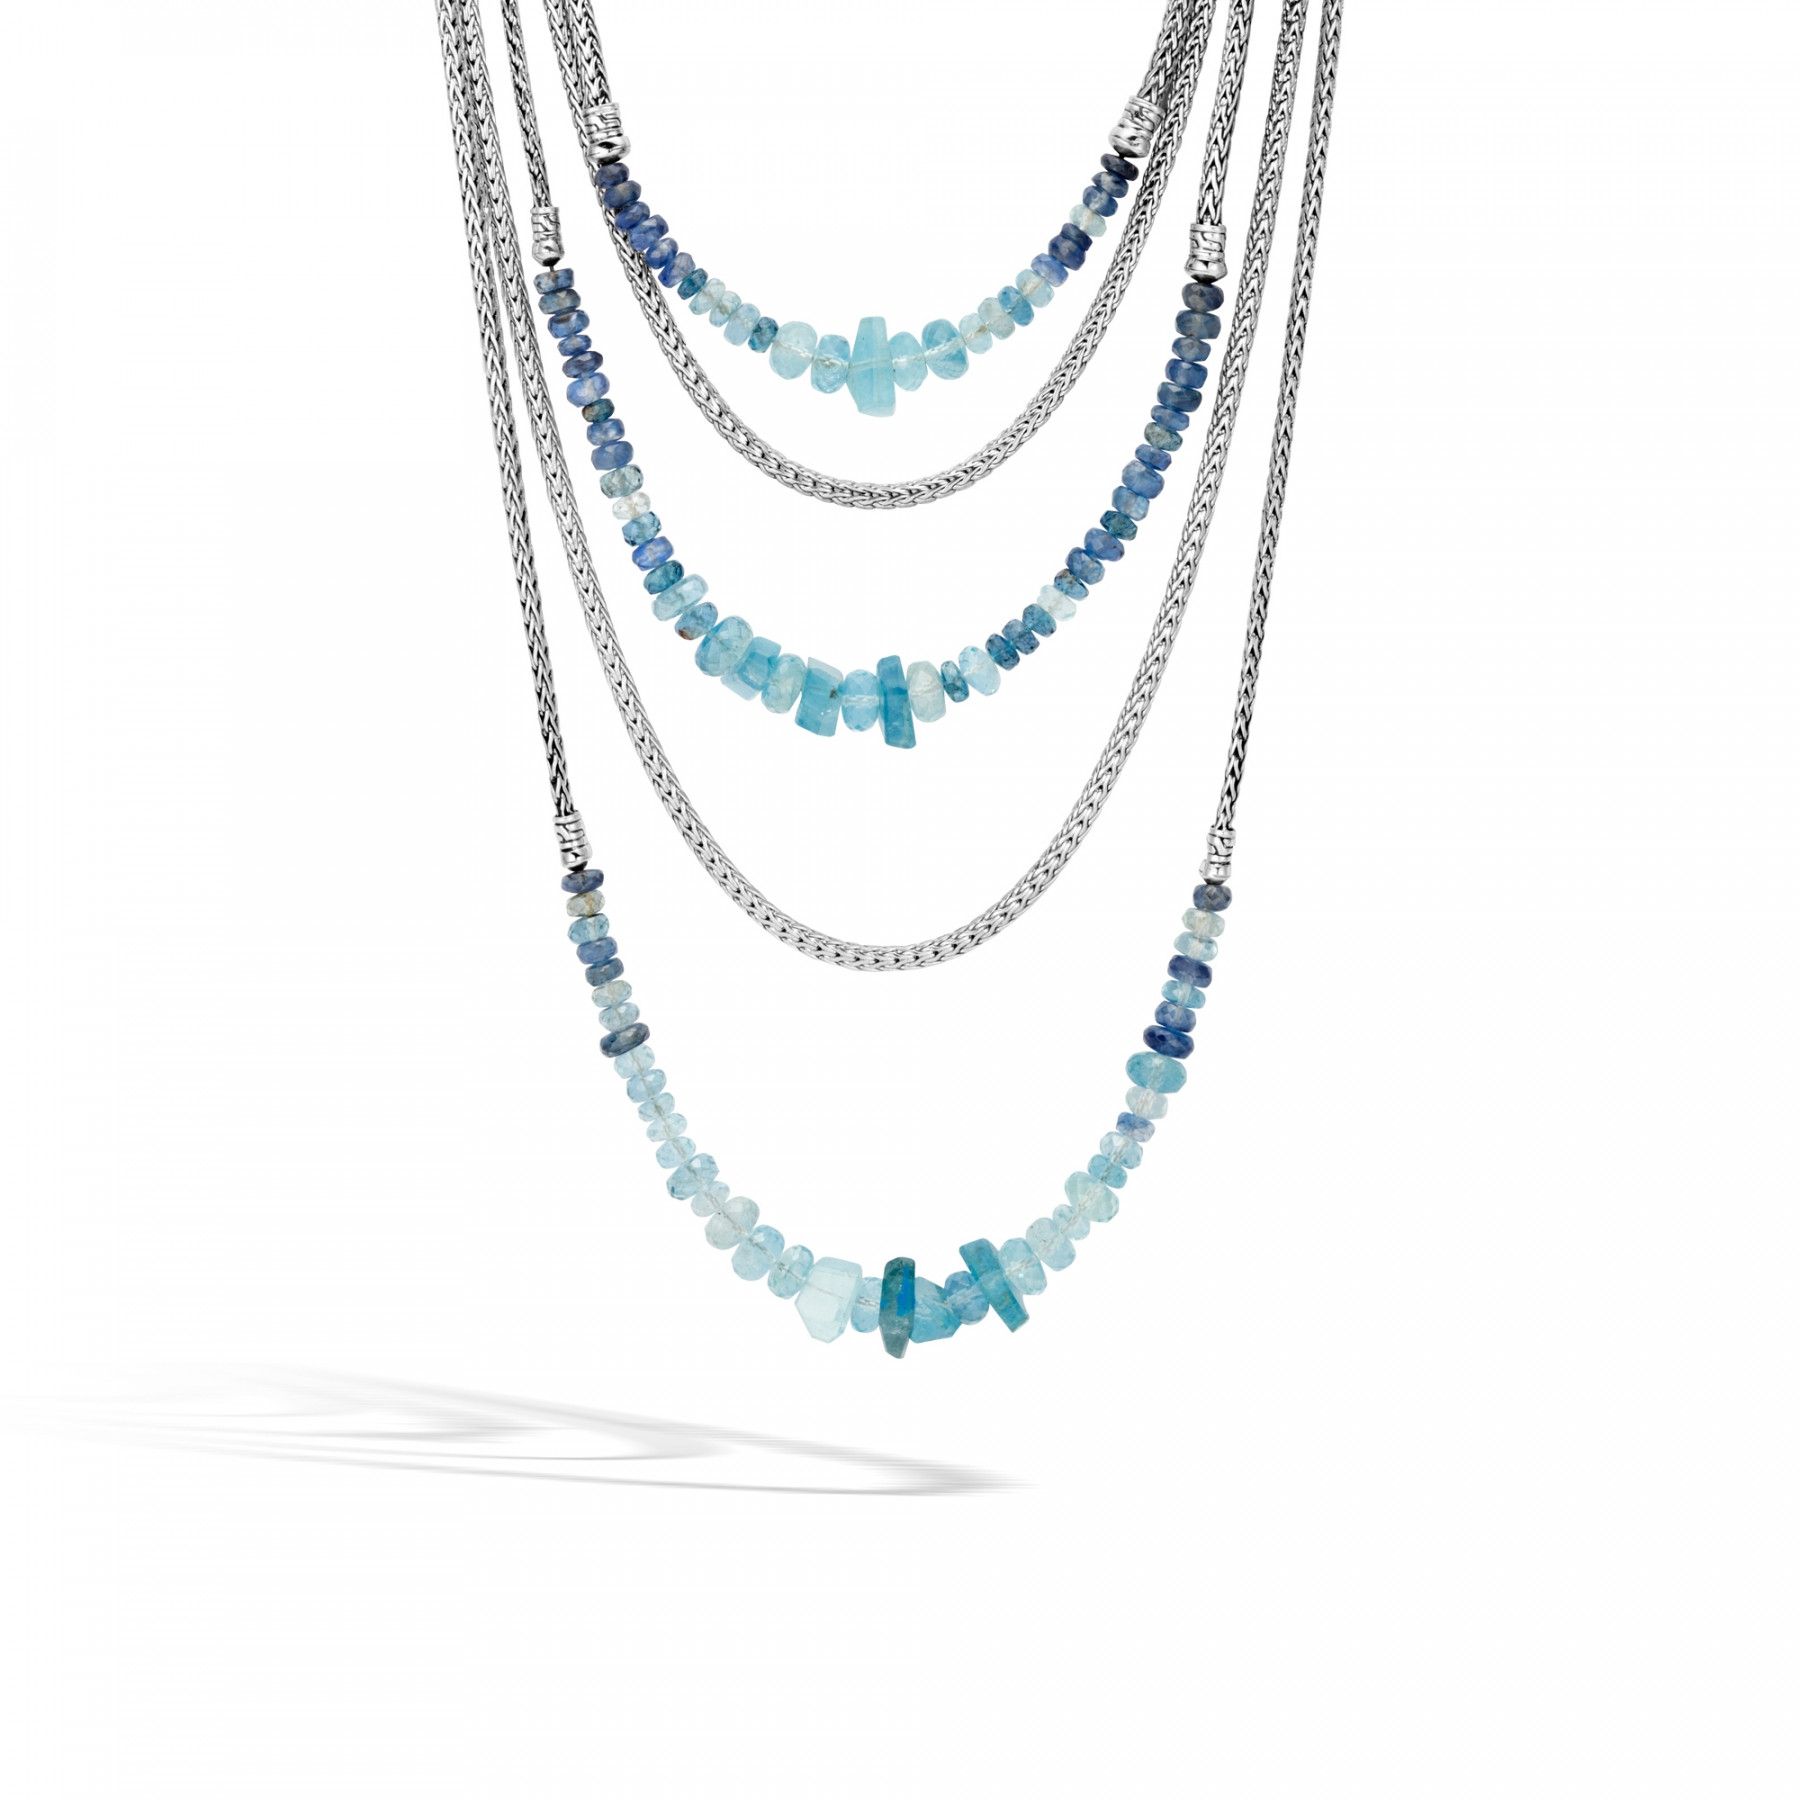 John Hardy Asli Classic Chain Layered Necklace with Aquamarine